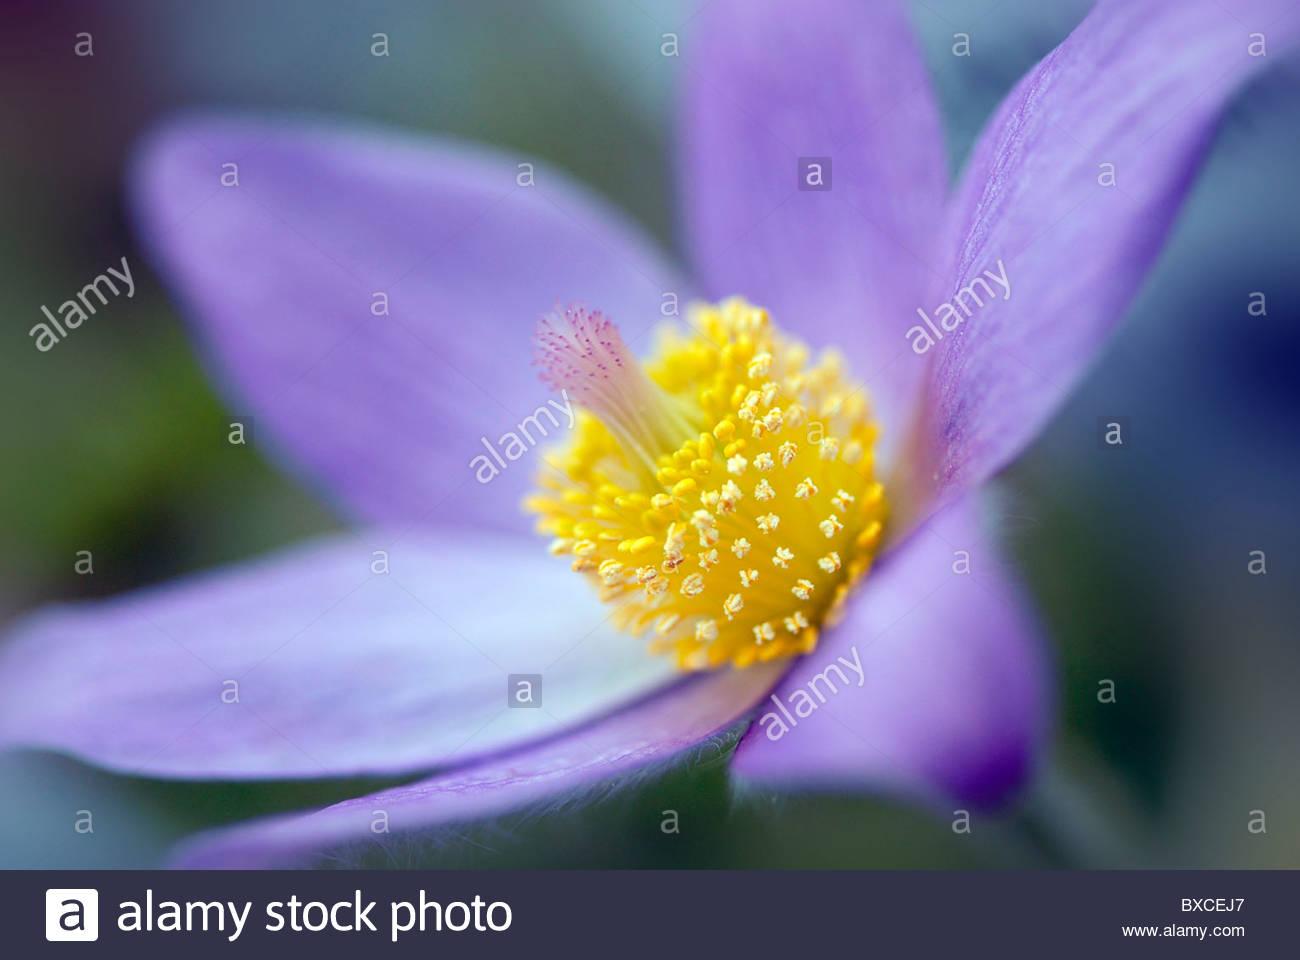 Un seul Pulsatilla vulgaris Anémone pulsatille - Fleurs Photo Stock